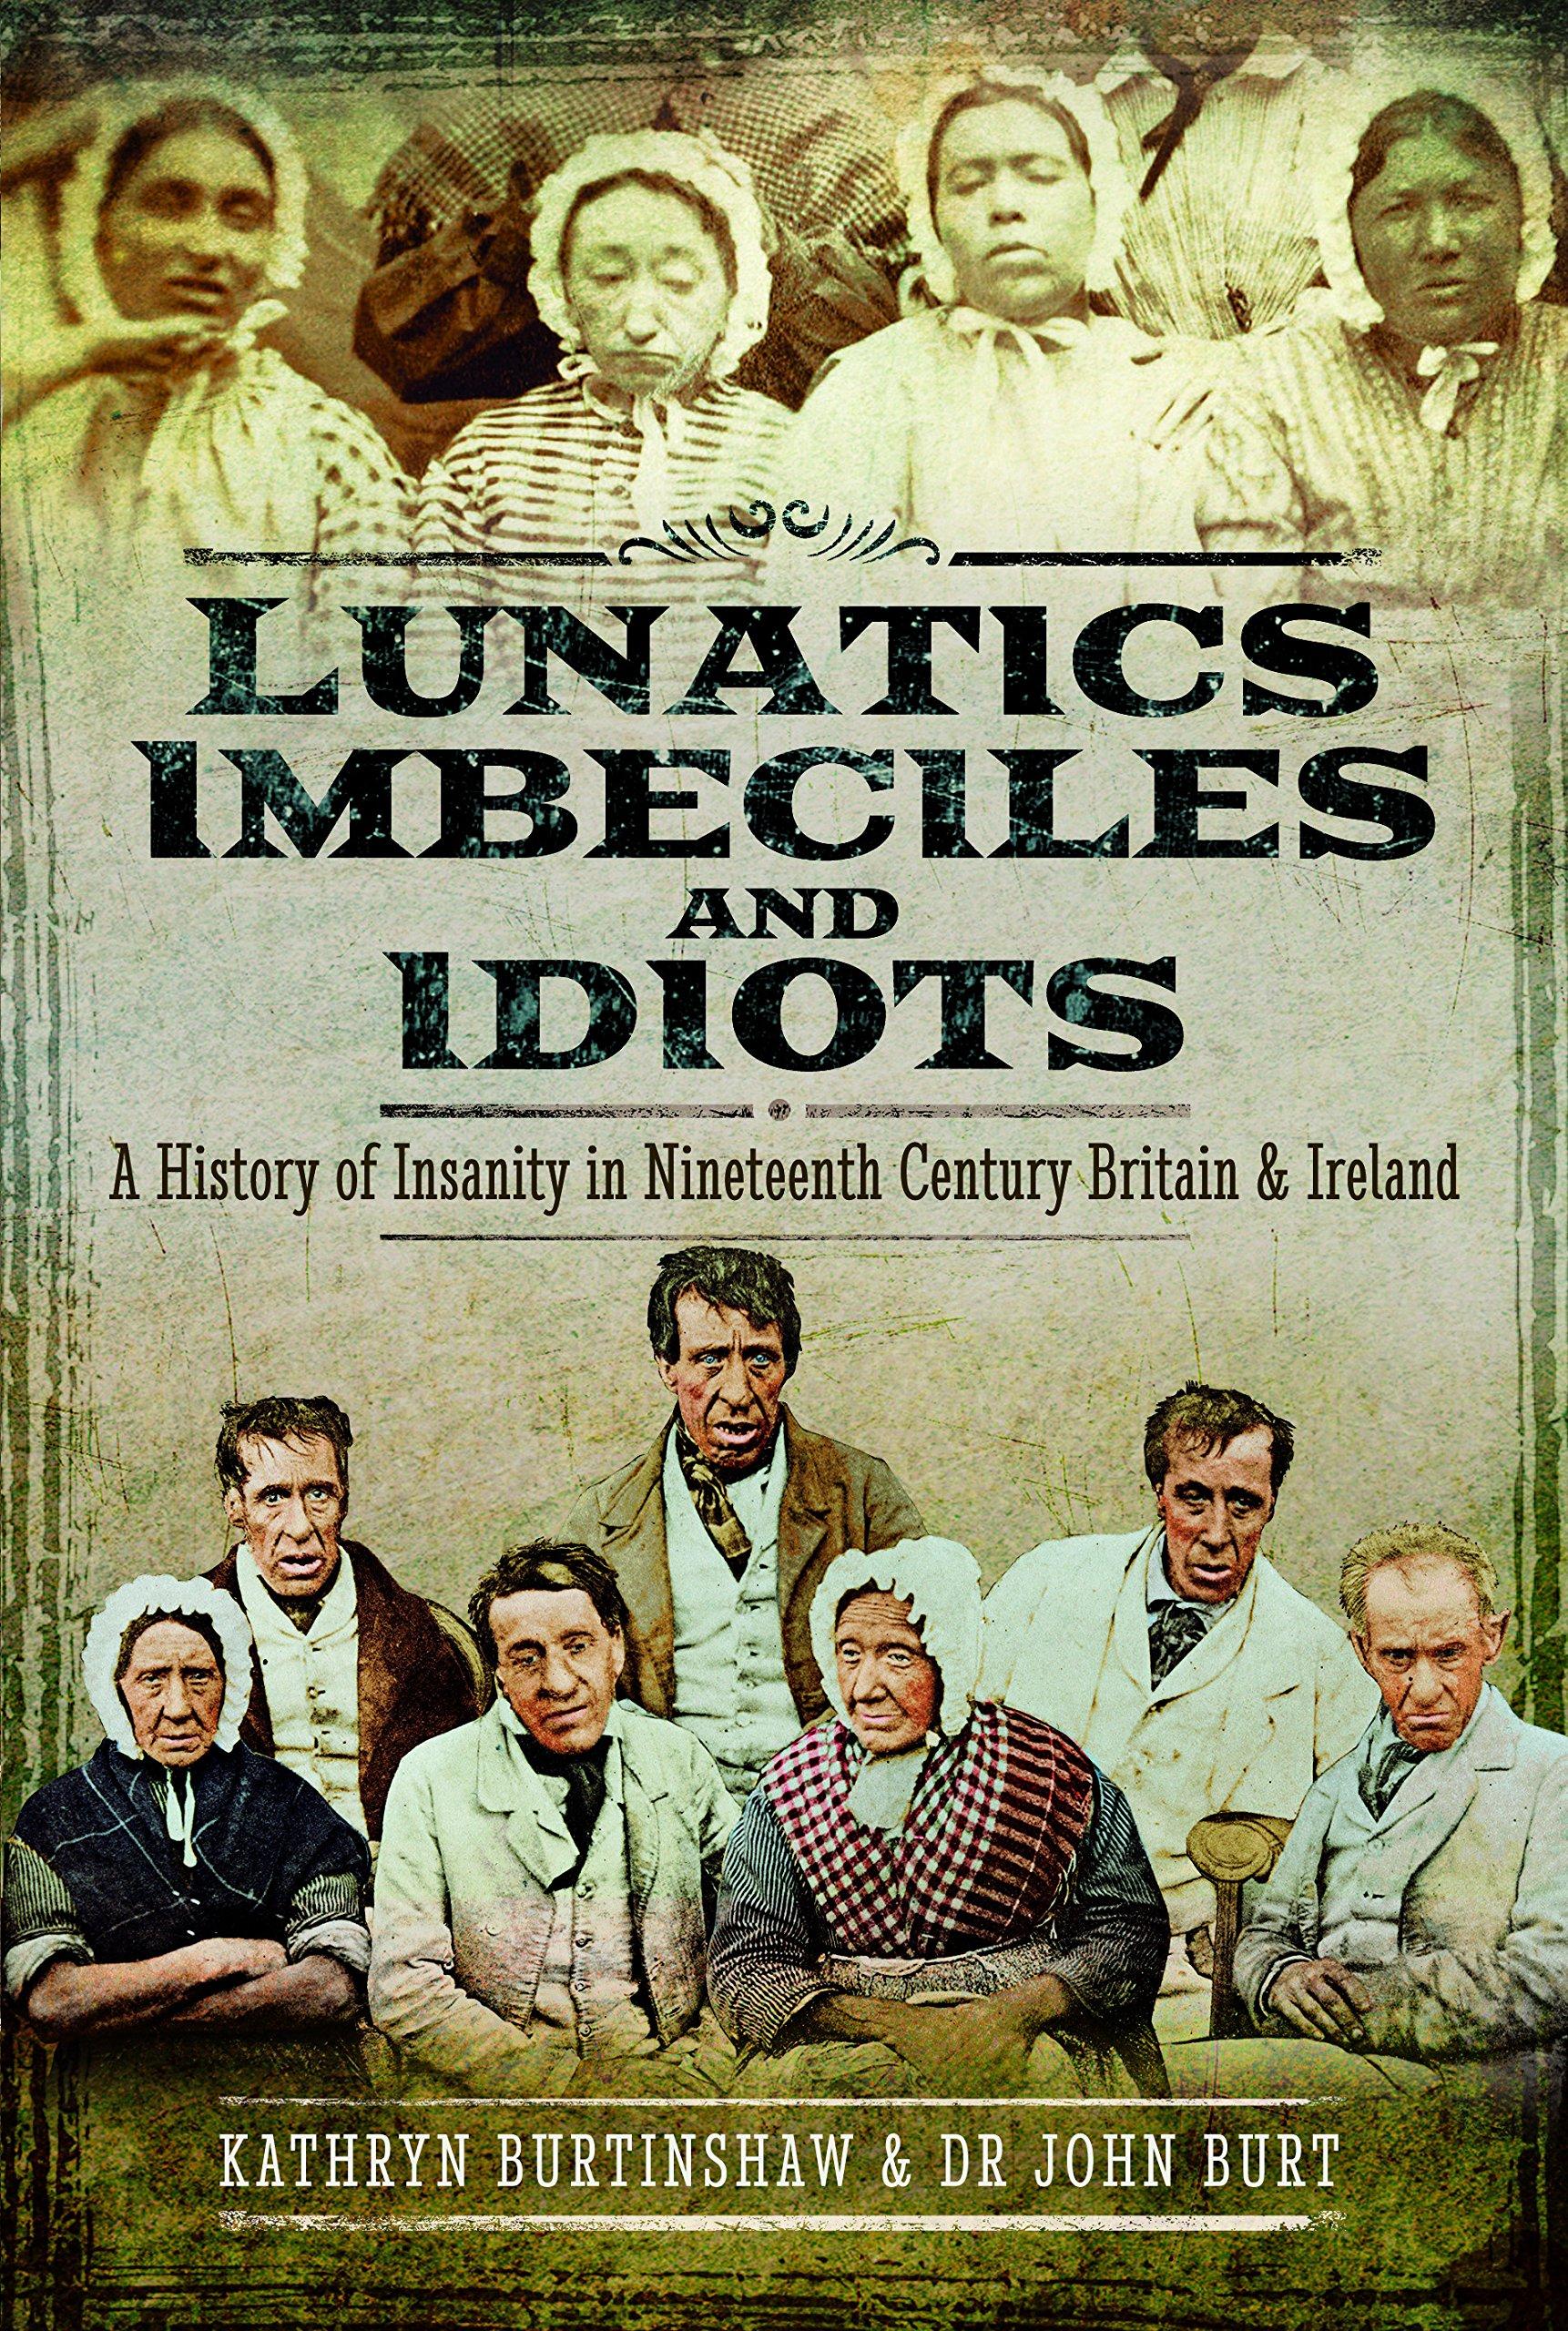 Institutionalizing the Insane in Nineteenth-Century England